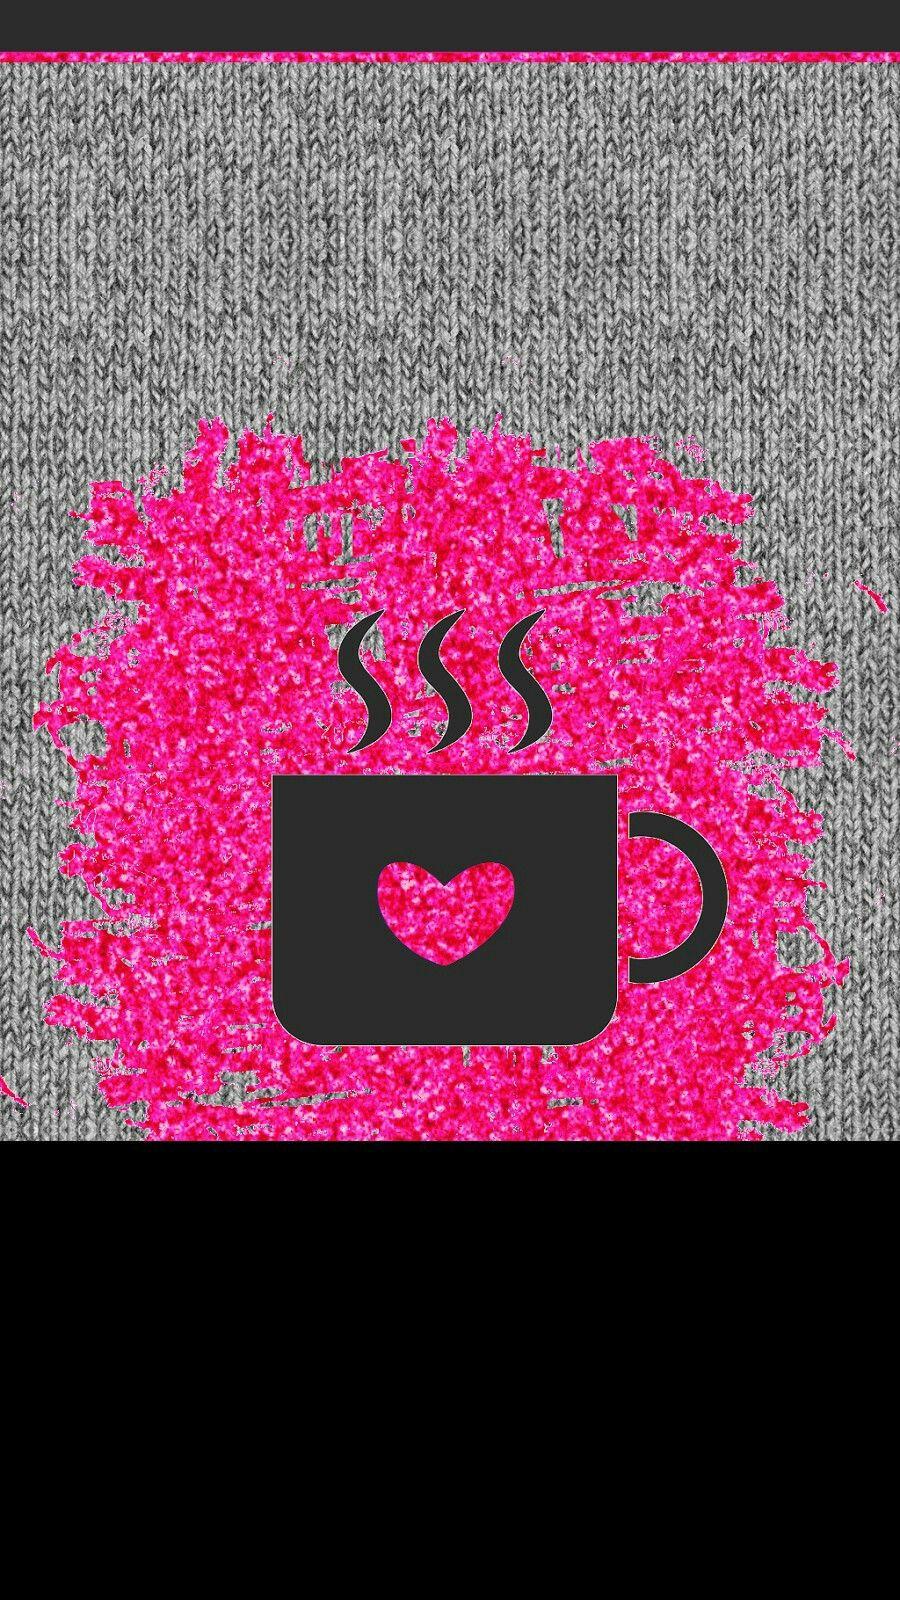 Popular Wallpaper Hello Kitty Hot Pink - 7ff3ff9e704cc0cda273f1ee8bf1d794  Snapshot_829150.jpg